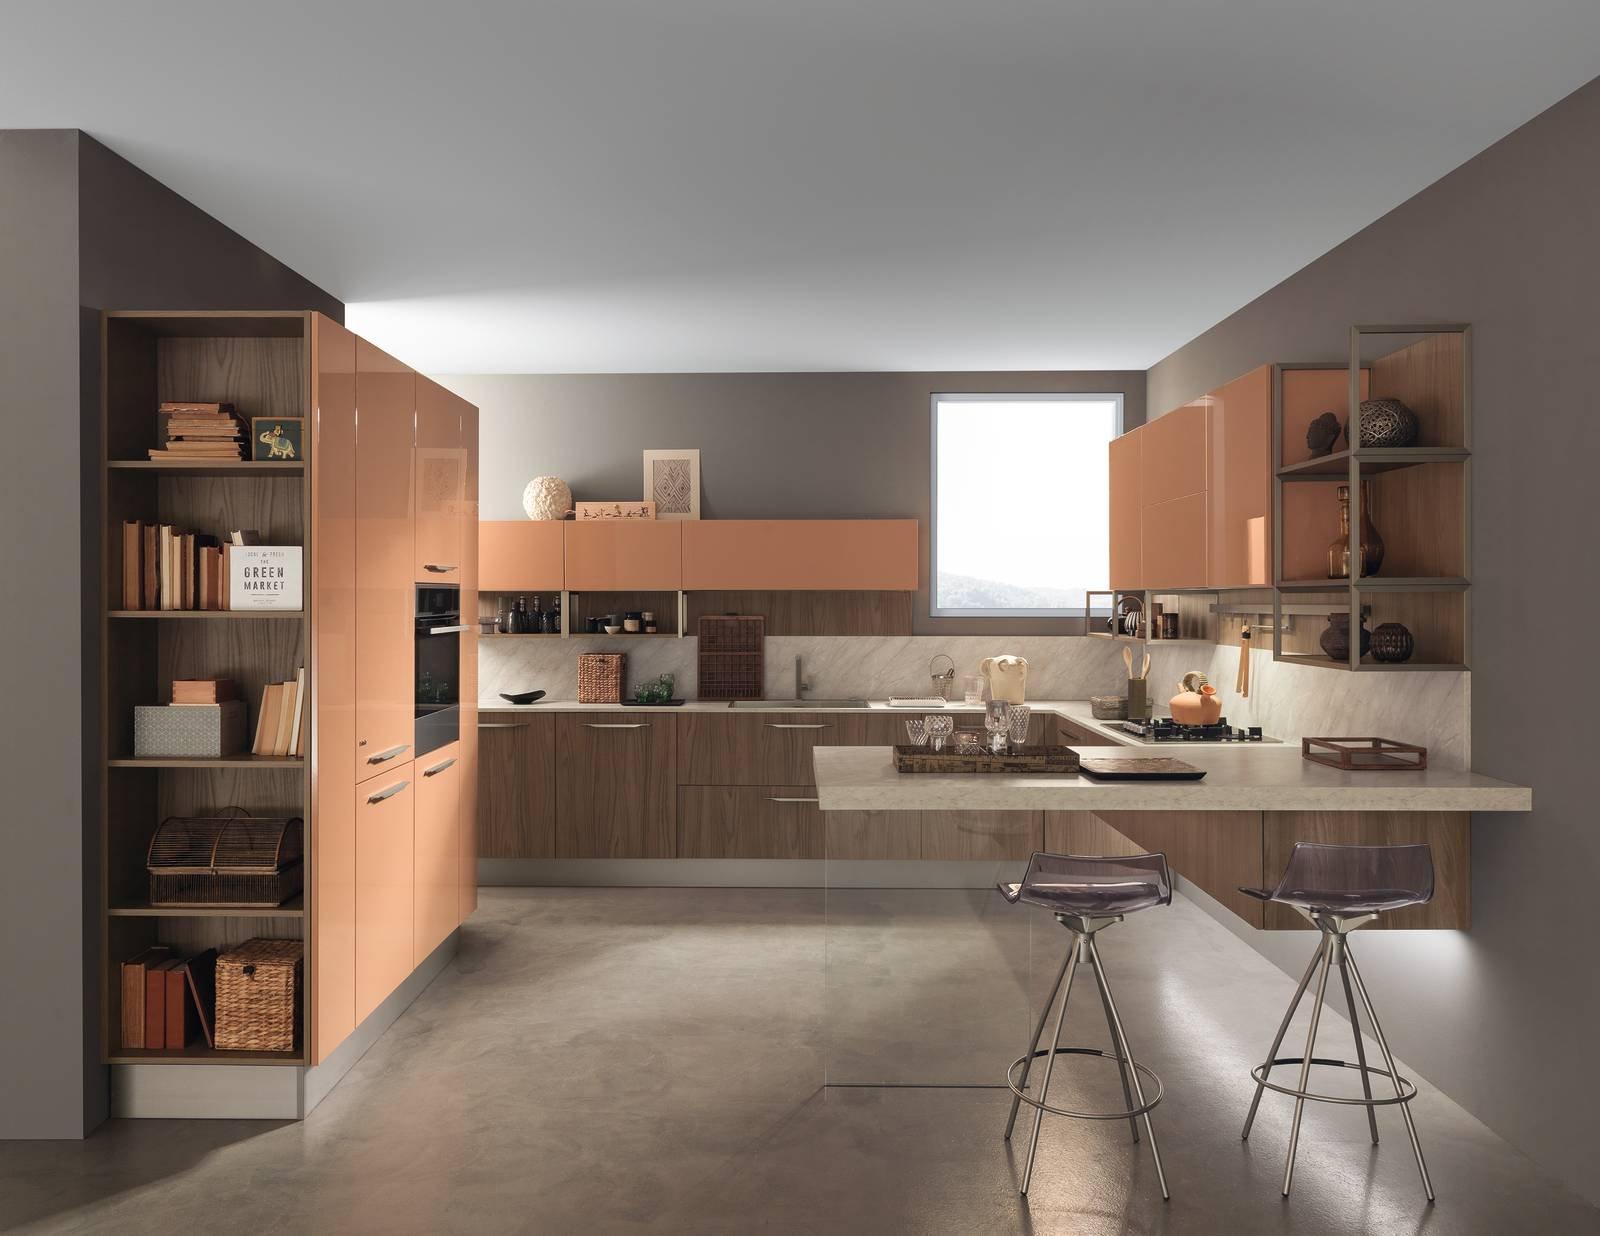 Top cucina laminato effetto legno top cucina in legno listellare o massello with top cucina - Top laminato cucina ...